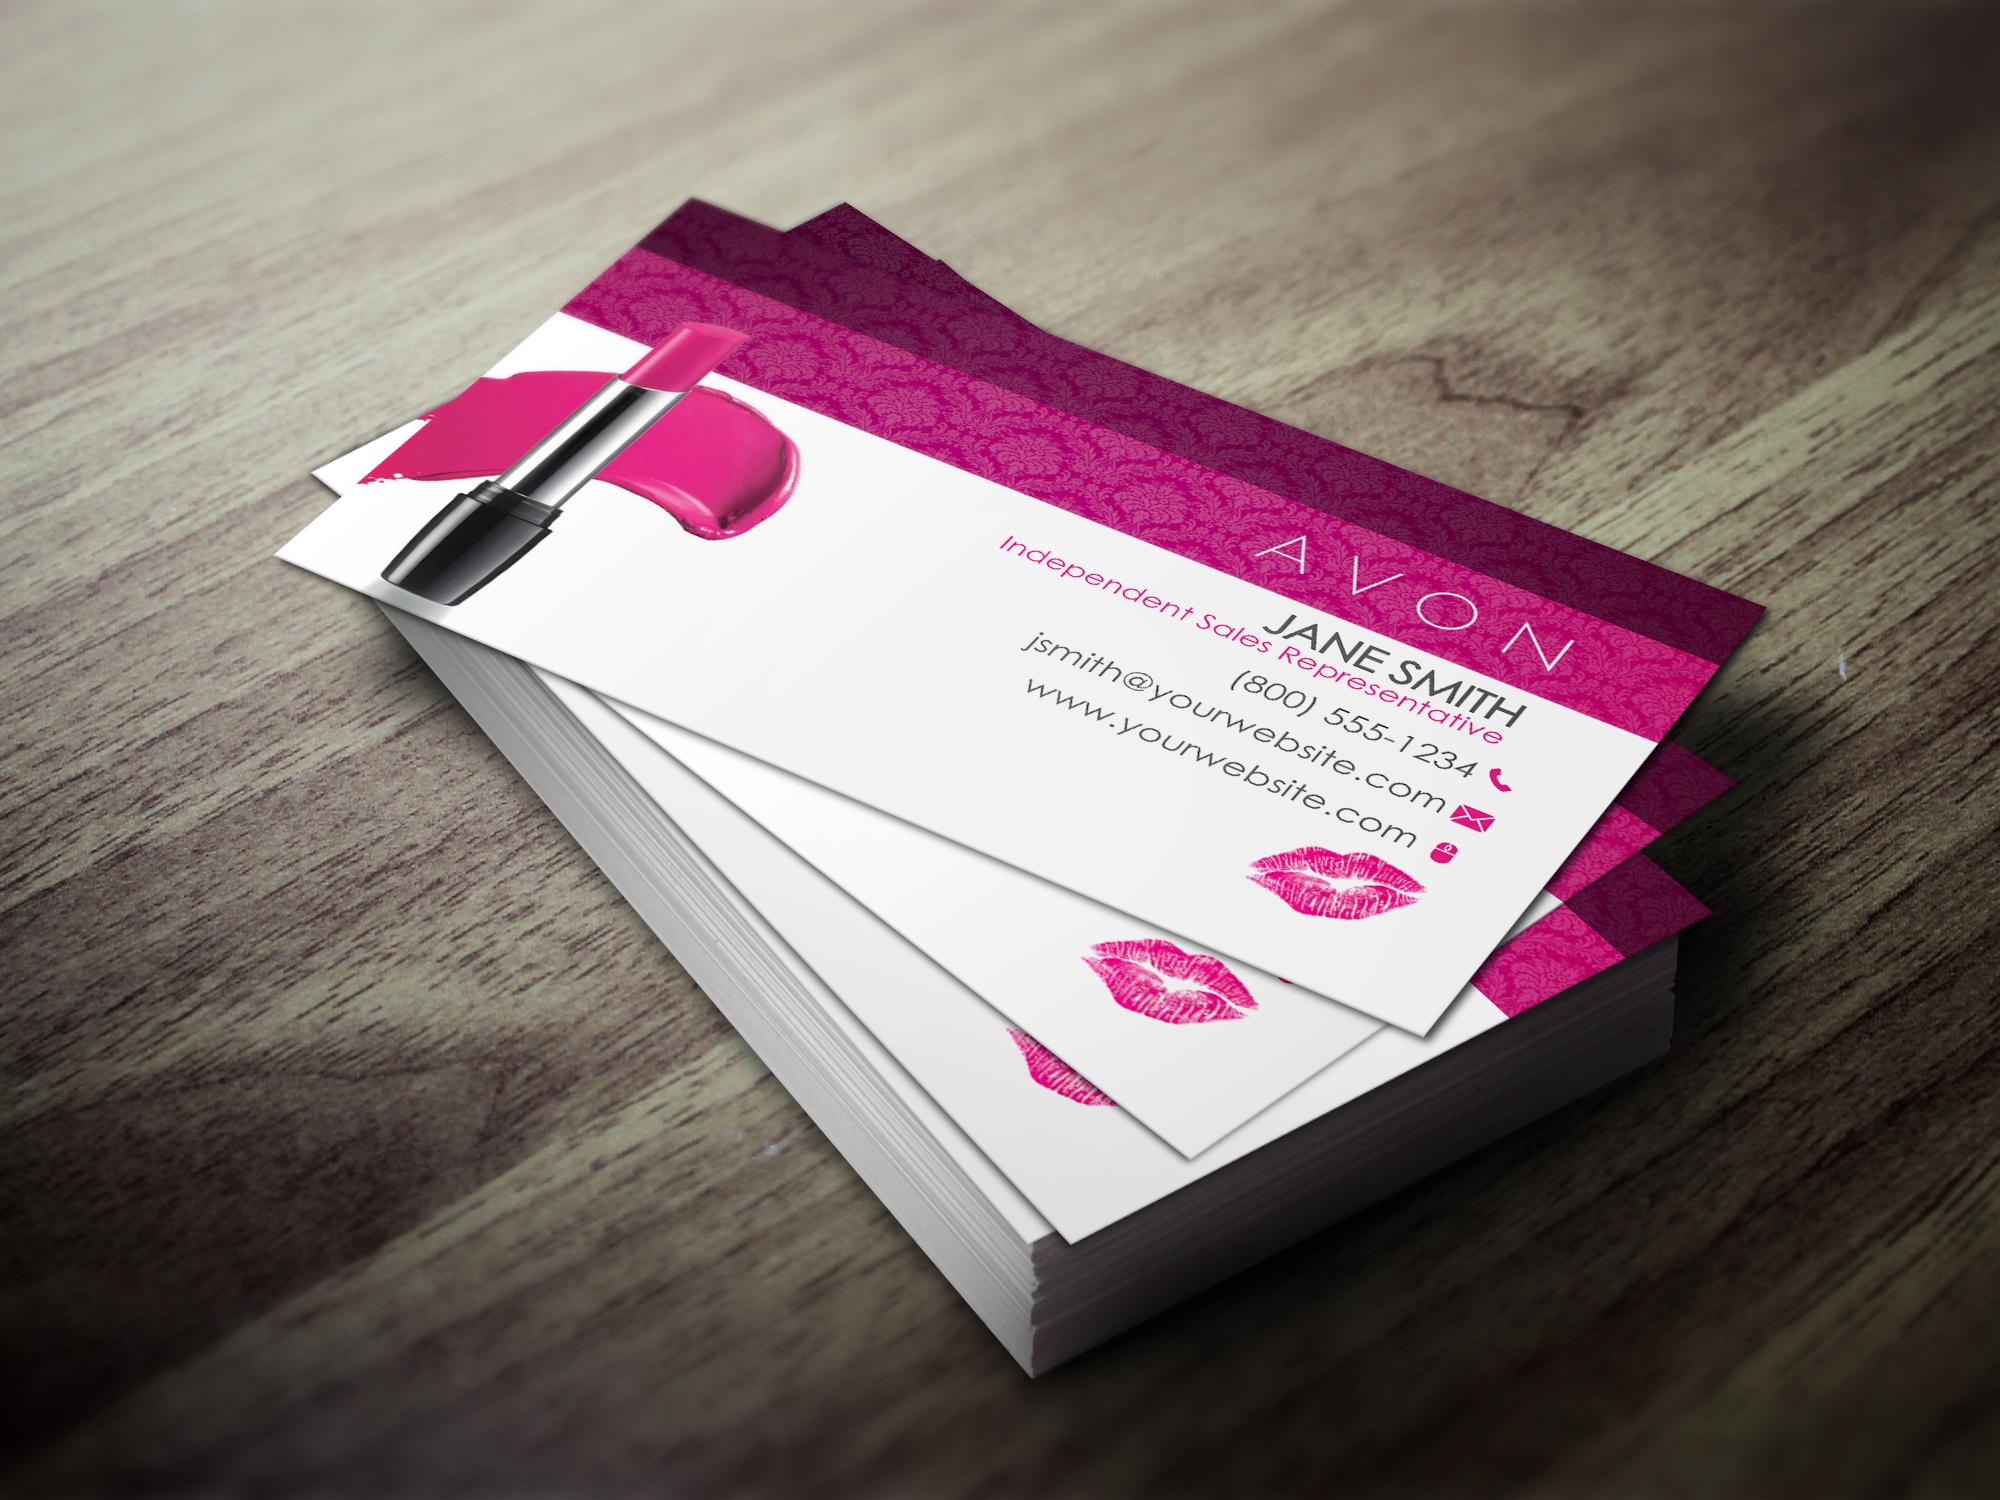 Avon Business Cards | Avon, Business cards and Business